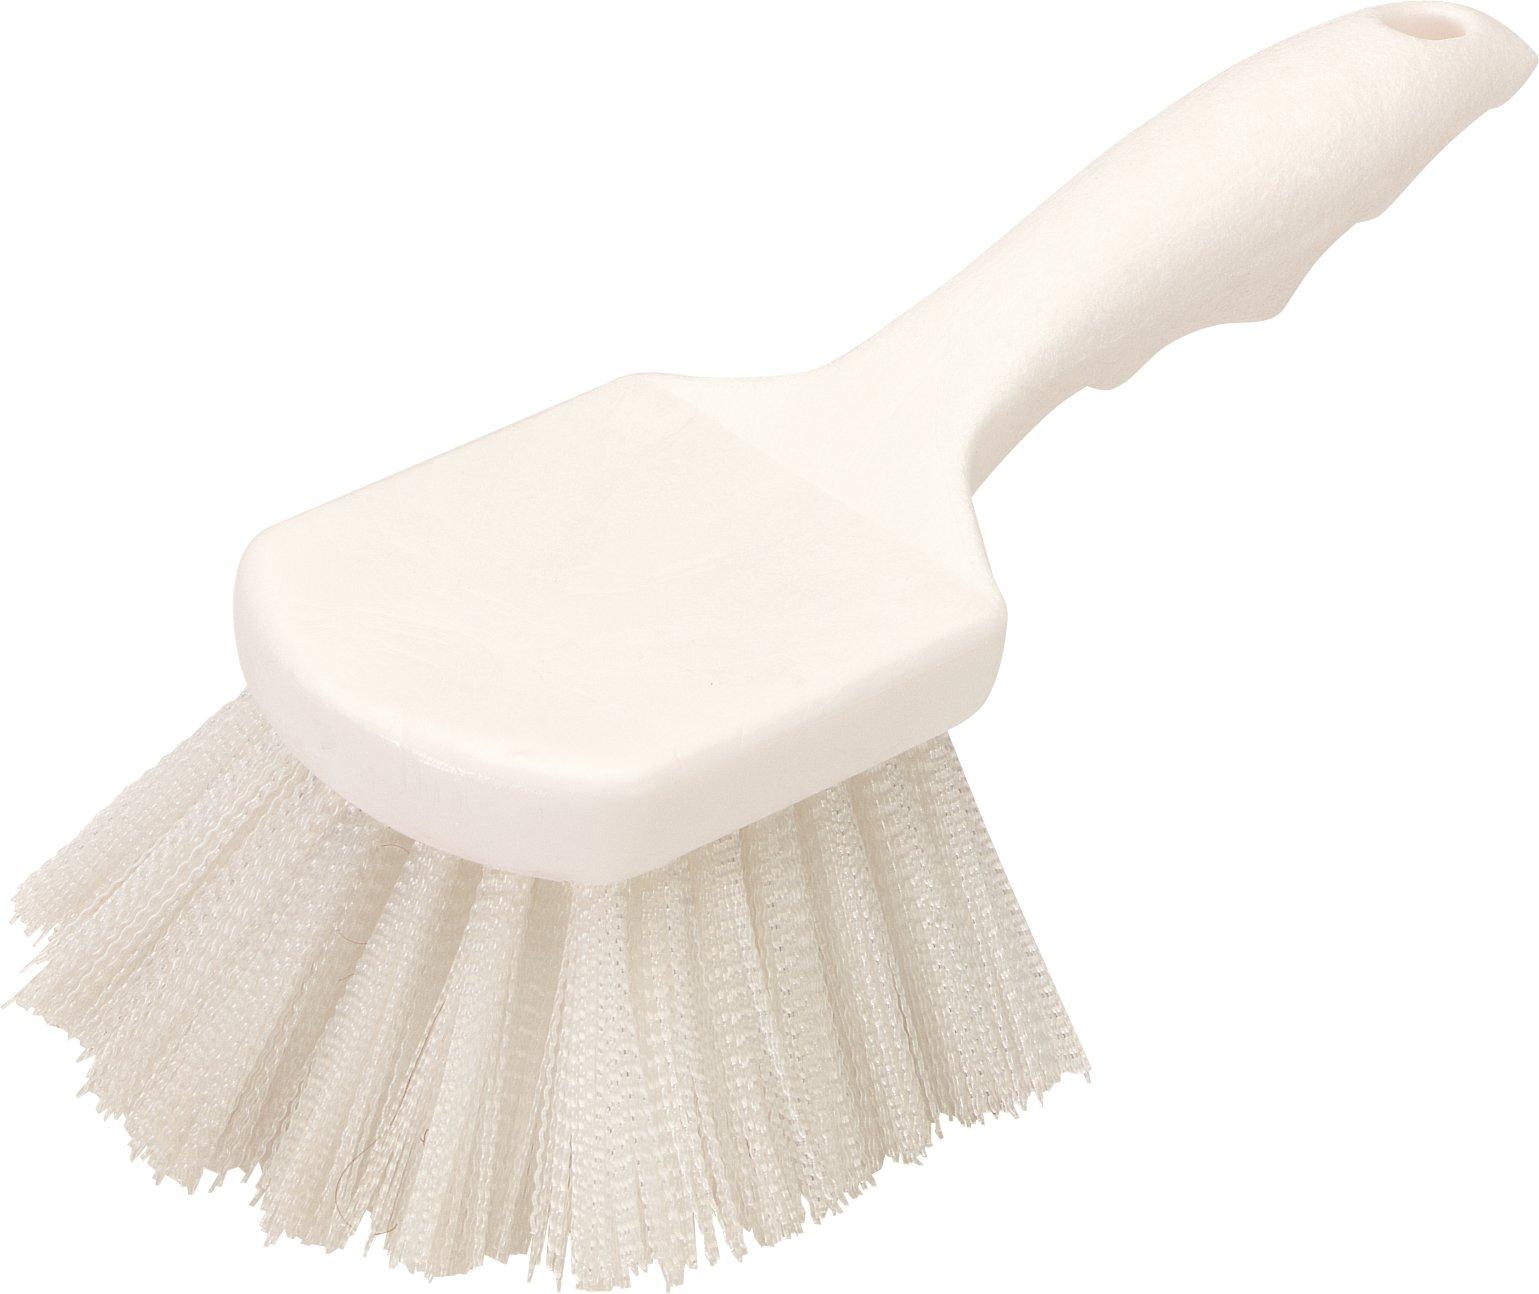 Carlisle 3662000 Flo-Pac Plastic Handle Utility Scrub Brush, Nylon Bristles, 2'' Bristle Trim, 8'' Length, White (Pack of 12)